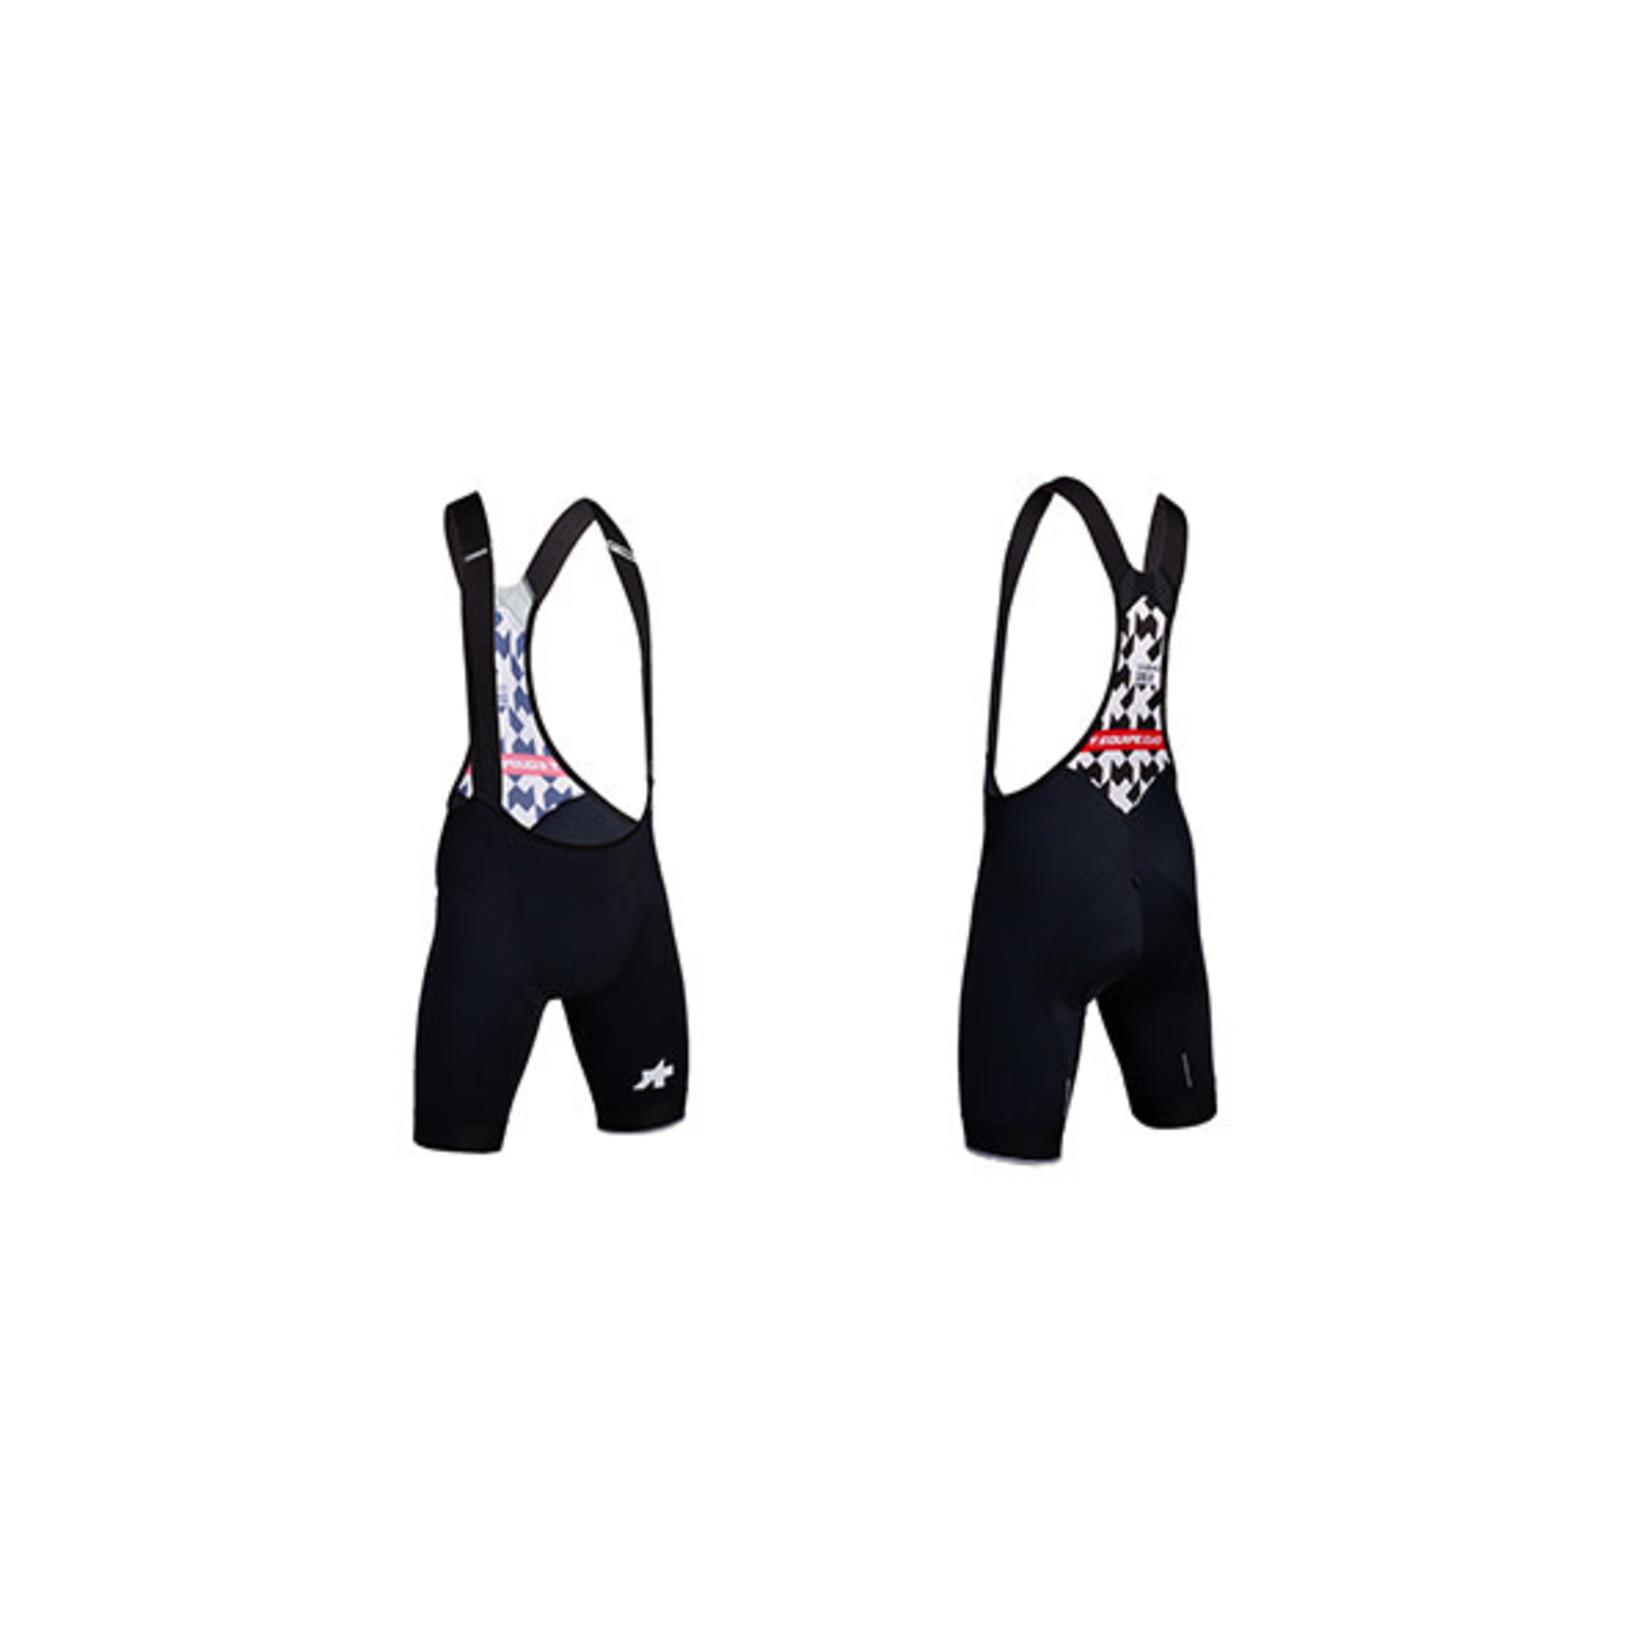 Assos Assos T Equipe Evo Bib Shorts Men's